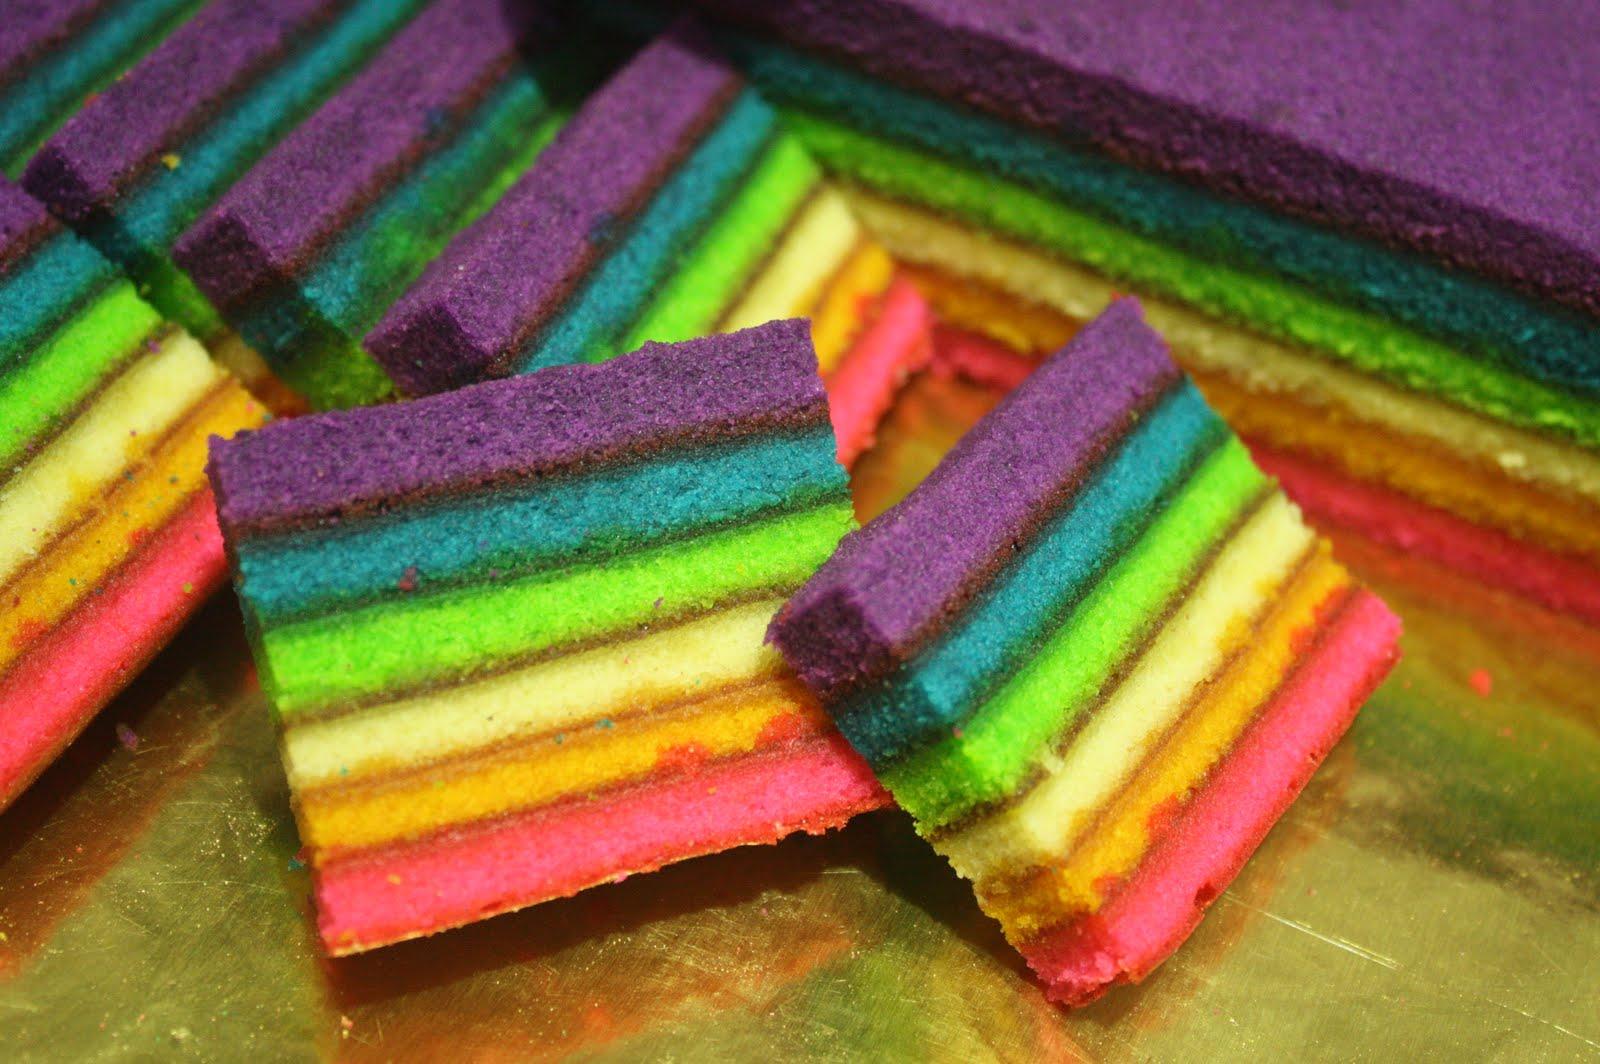 sarawak cake - photo #2